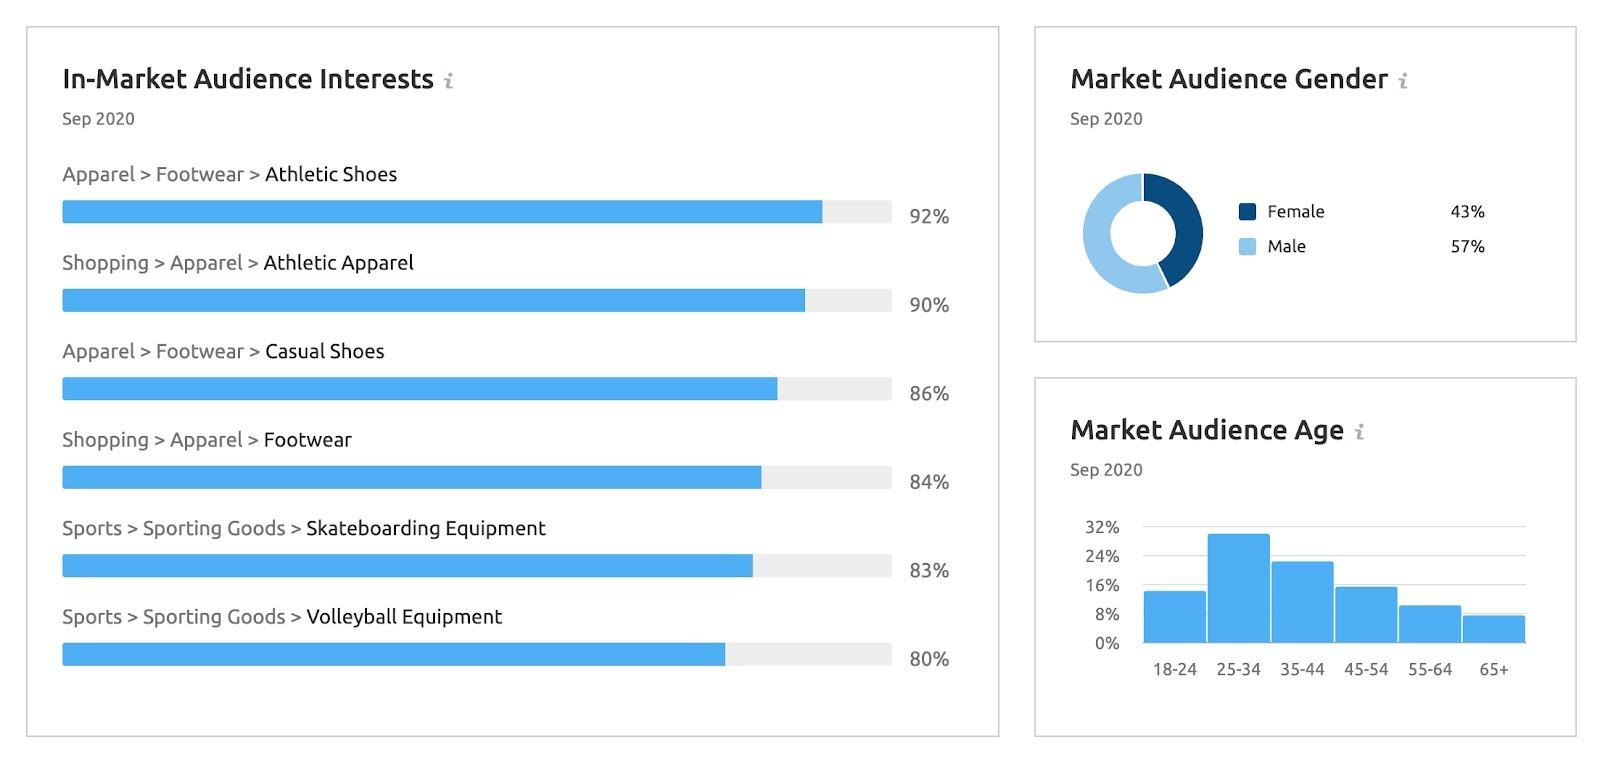 Market Explorer Tool market audience insights